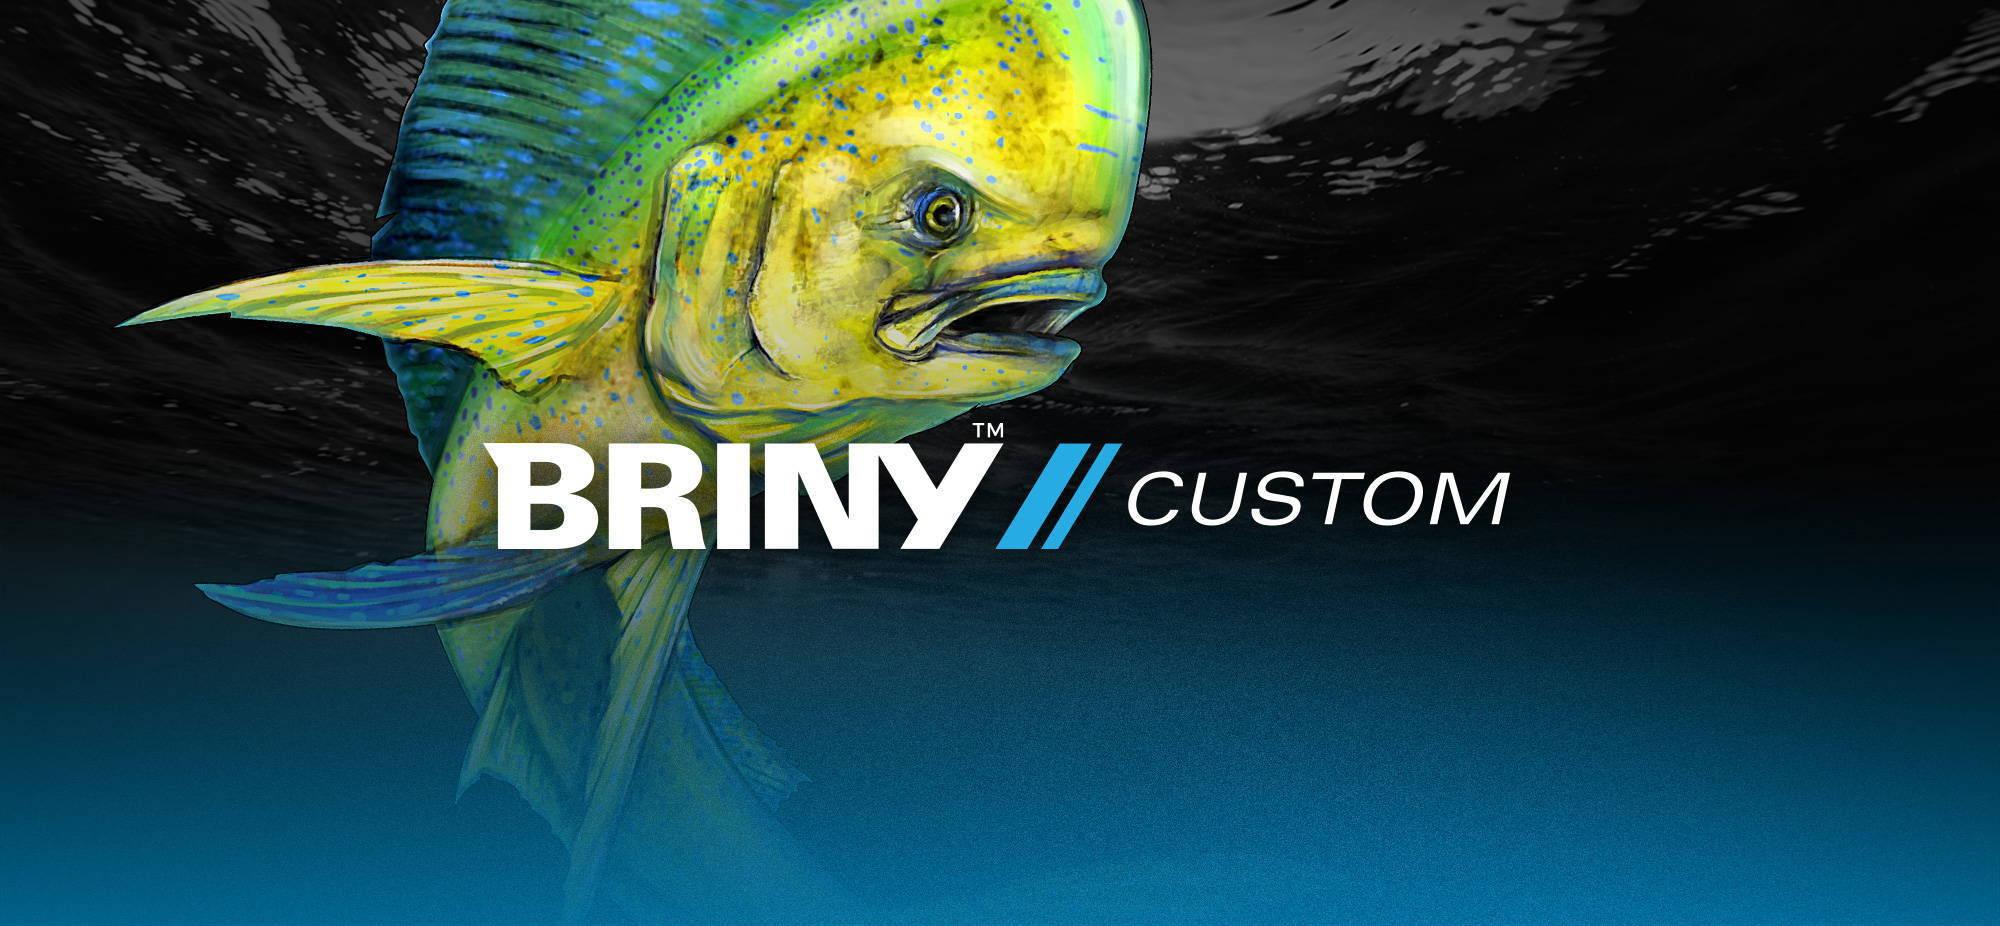 Briny Custom Fishing Shirts Boat Shirts To Order